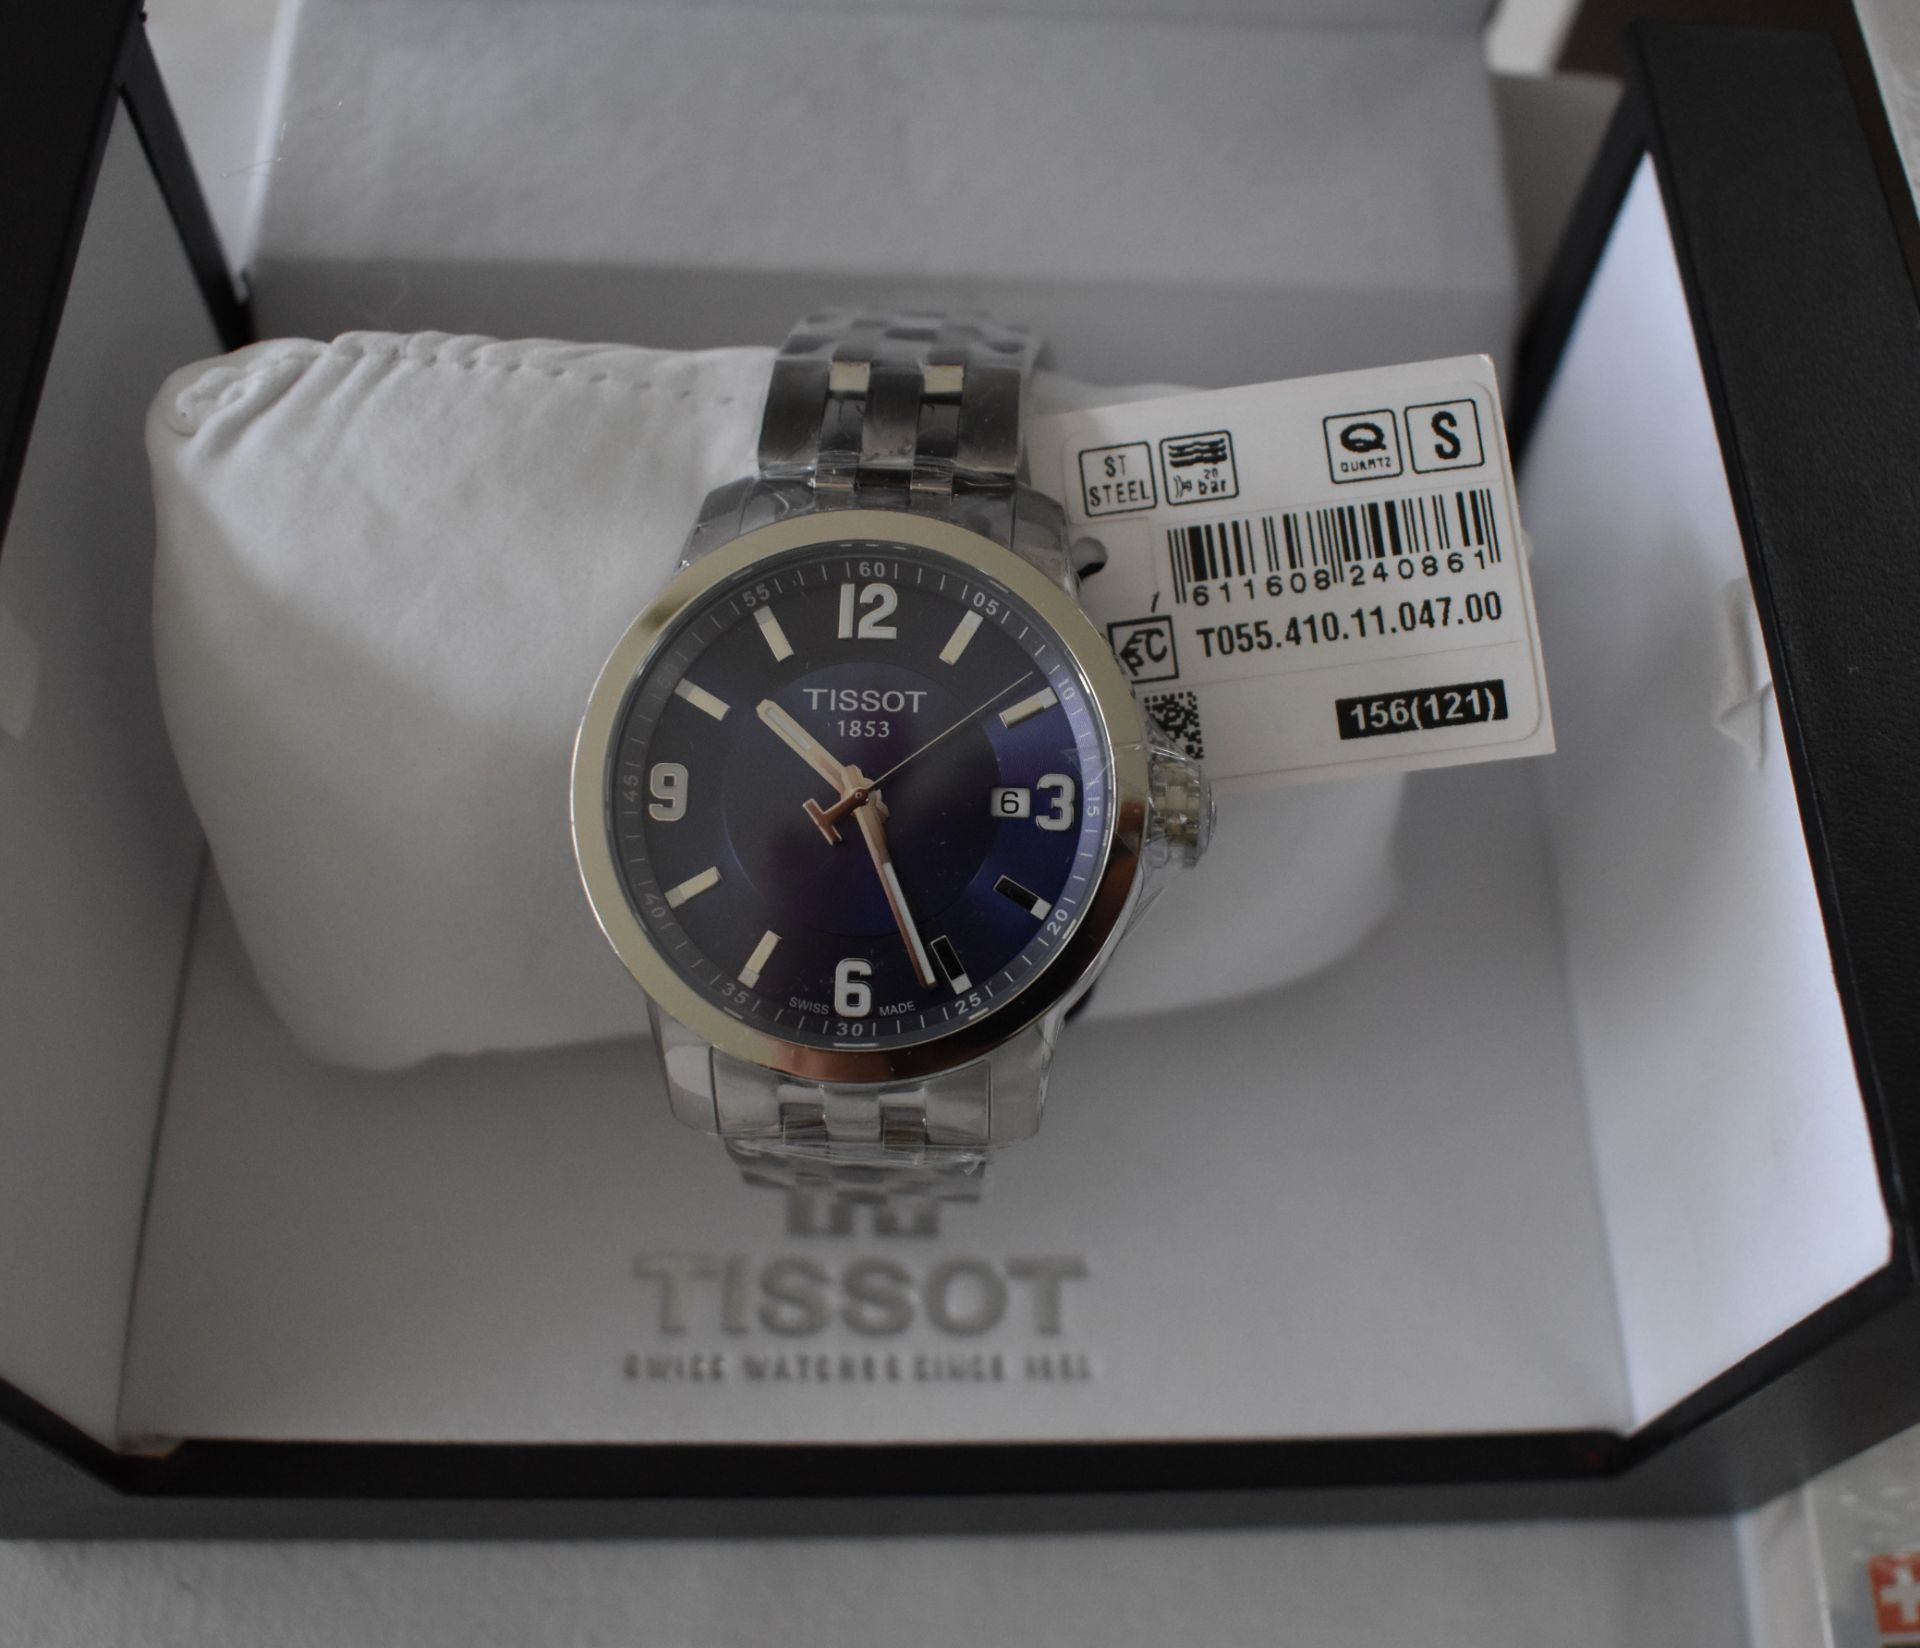 Tissot Men's Watch TO55.410.11.047.00 - Image 2 of 3